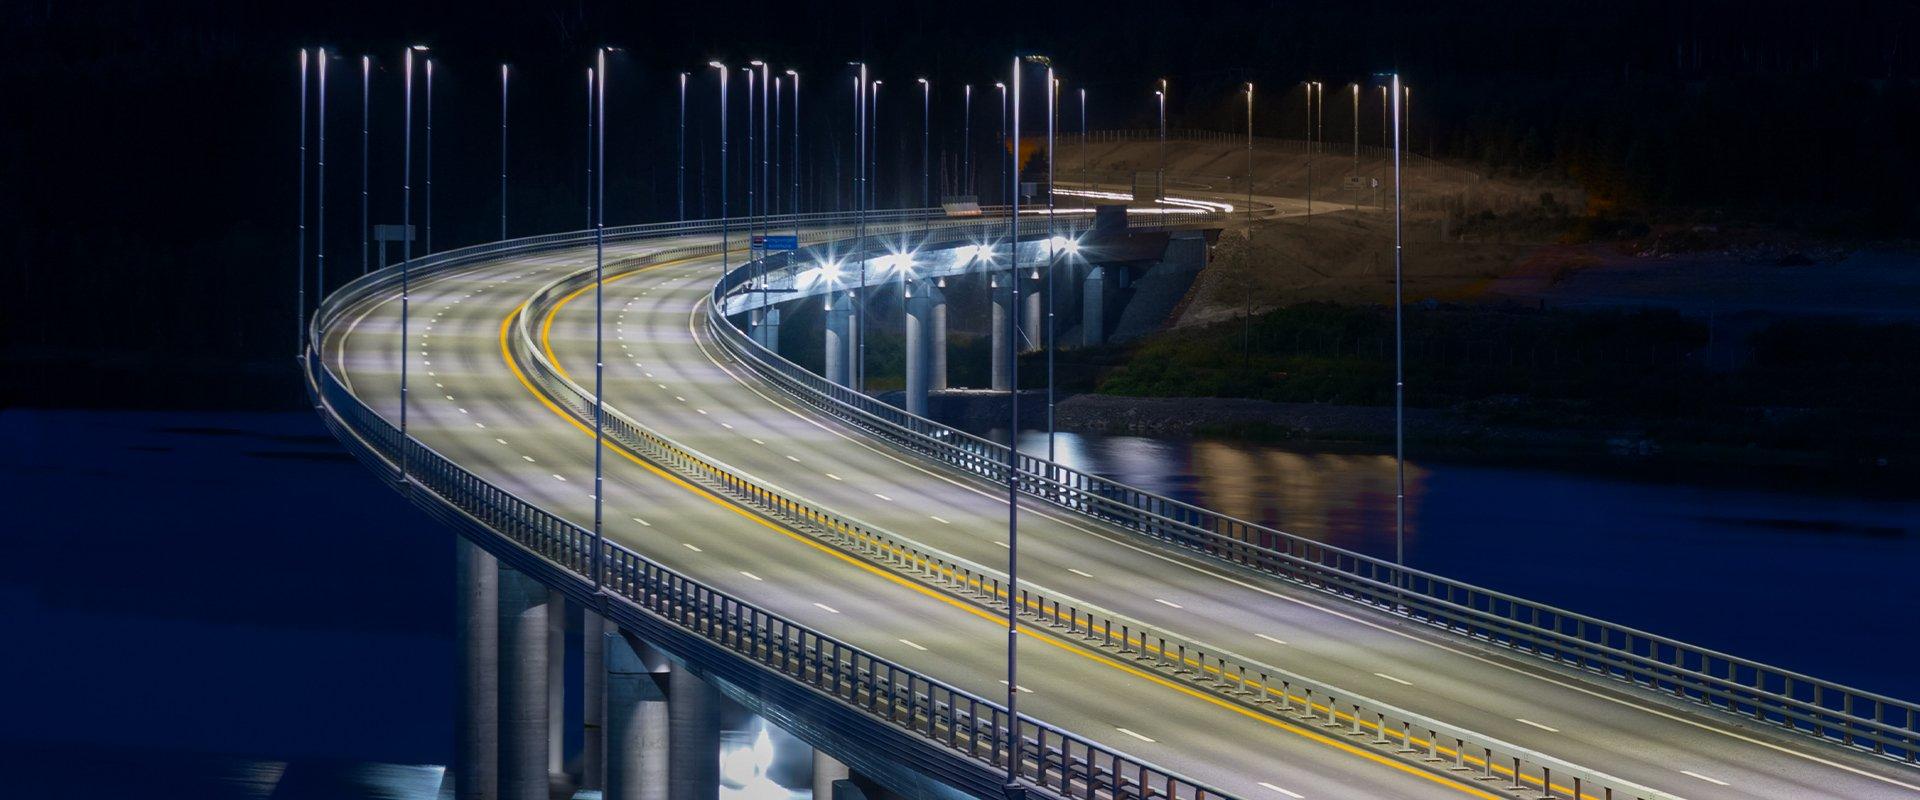 Lampione LED stradale